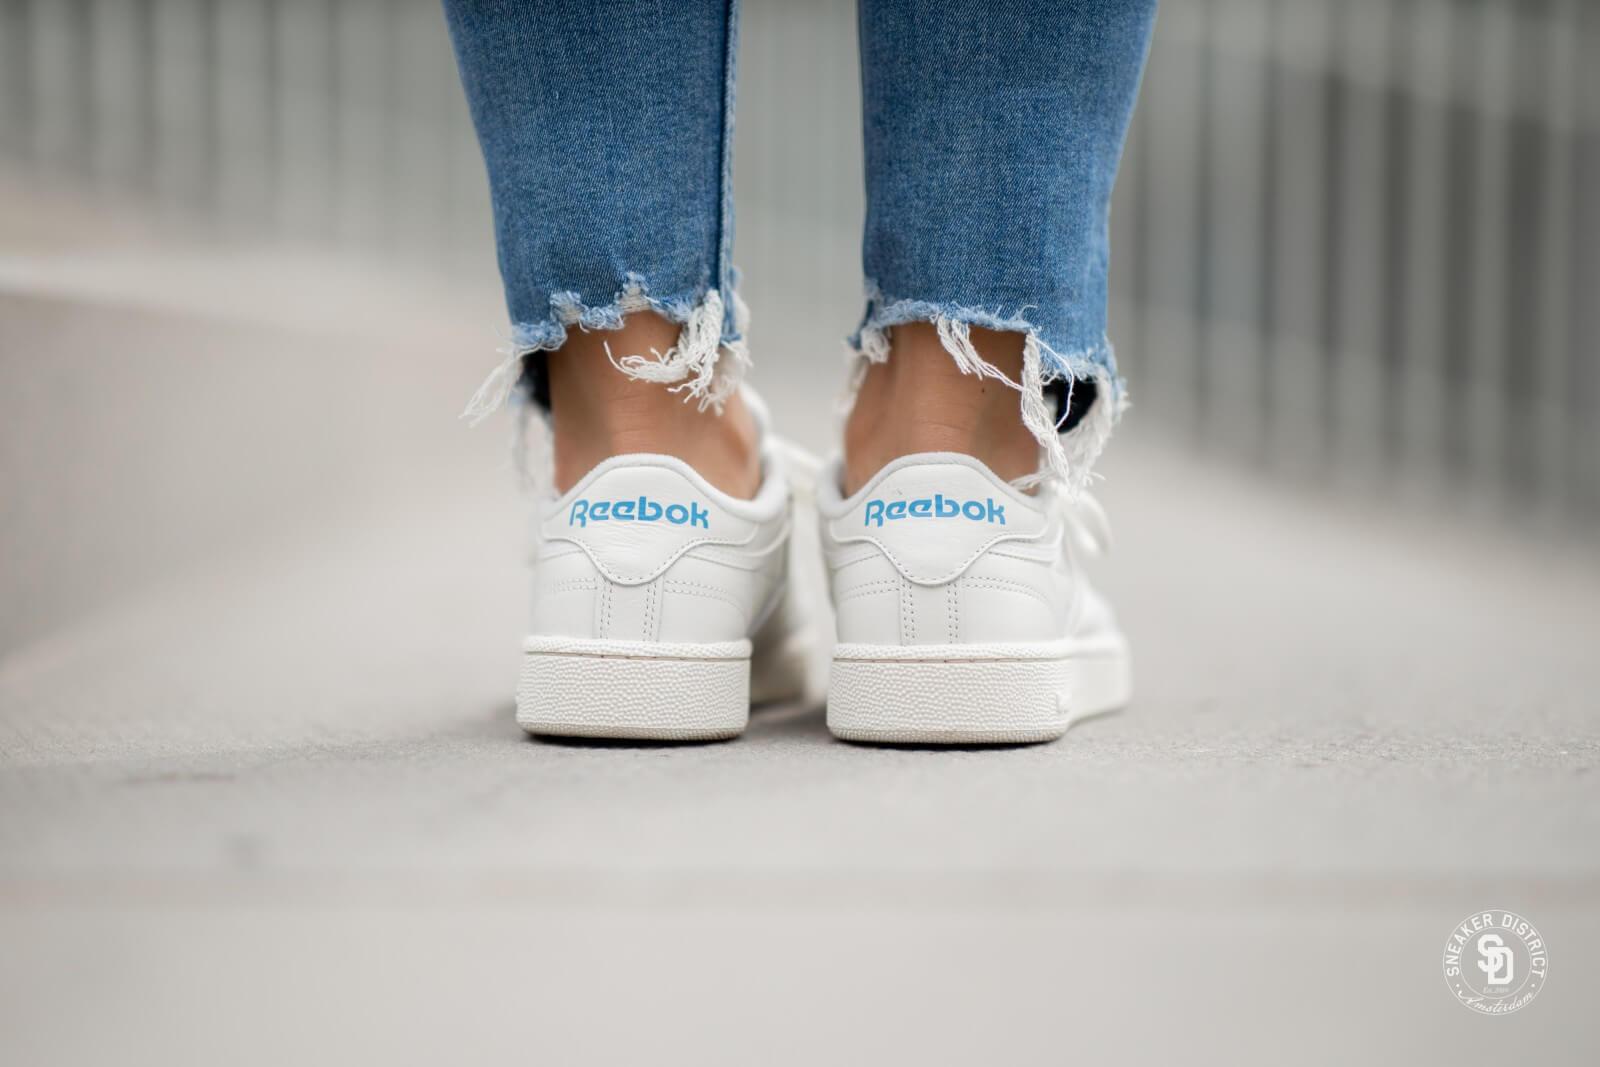 Reebok Club C 85 MU chalkpaperhwitecyan Fashion sneakers